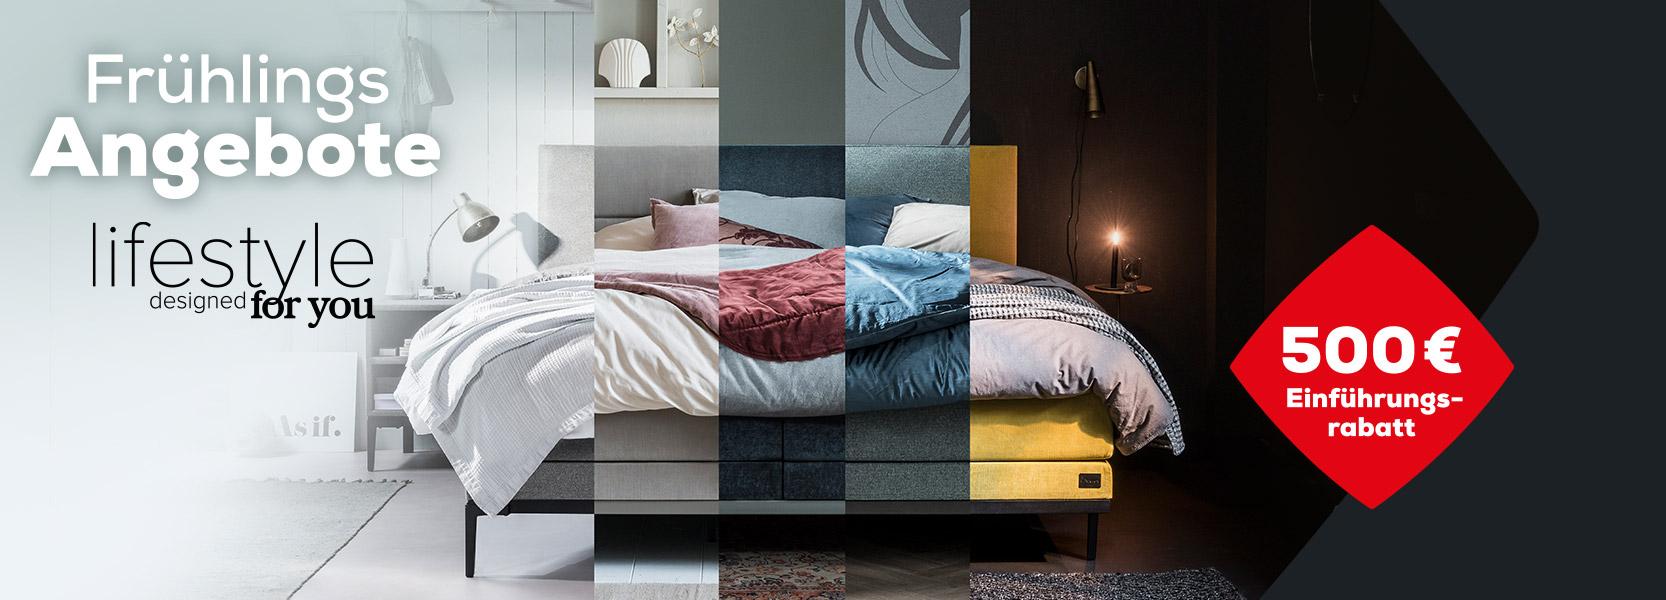 Lifestyle designed for you Kollektion Frühlings Angebote| Swiss Sense